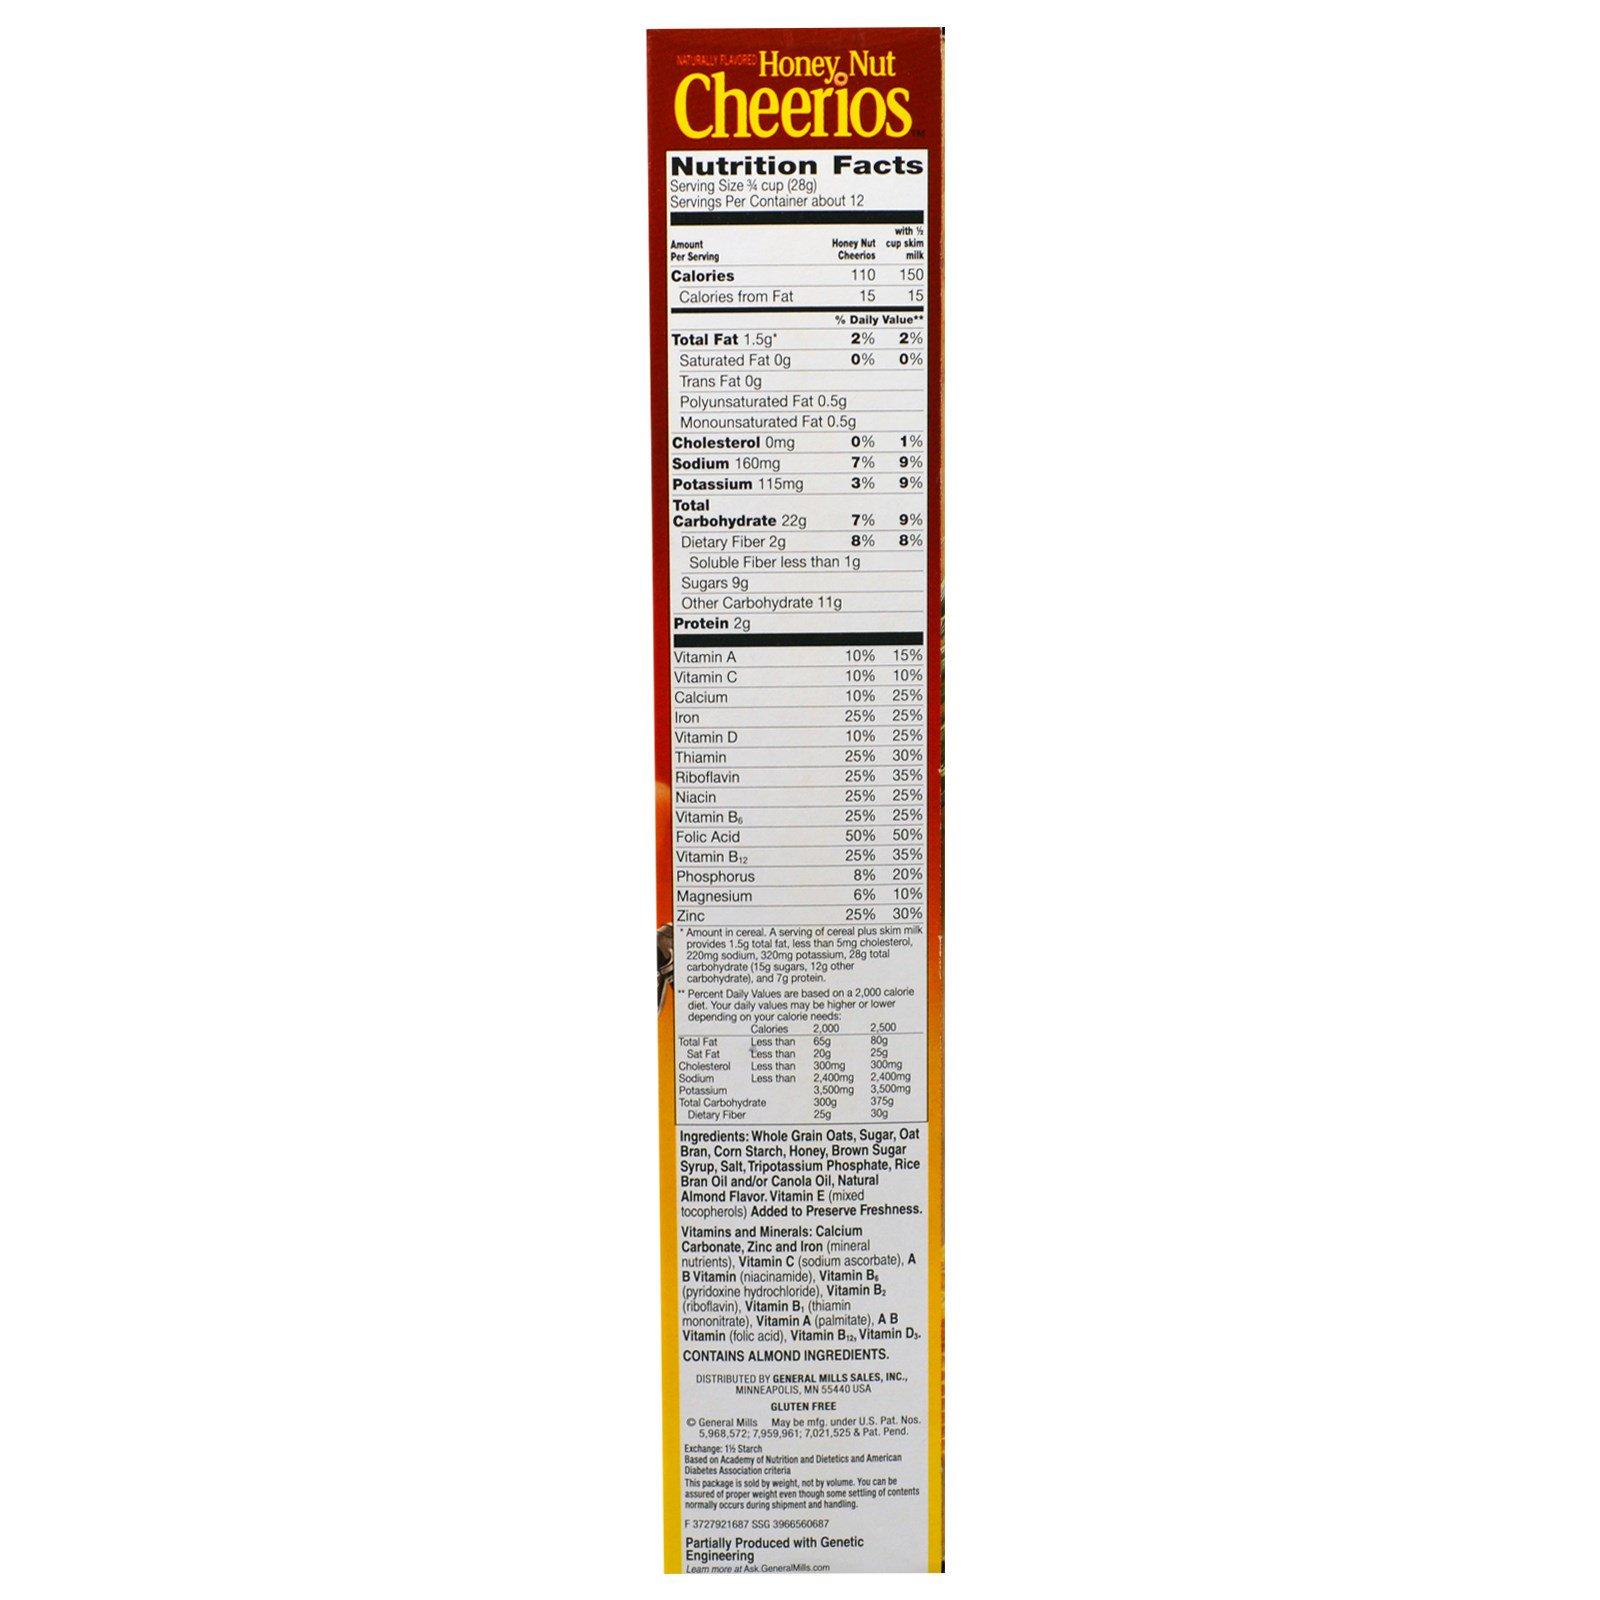 General Mills, Honey Nut Cheerios, 12